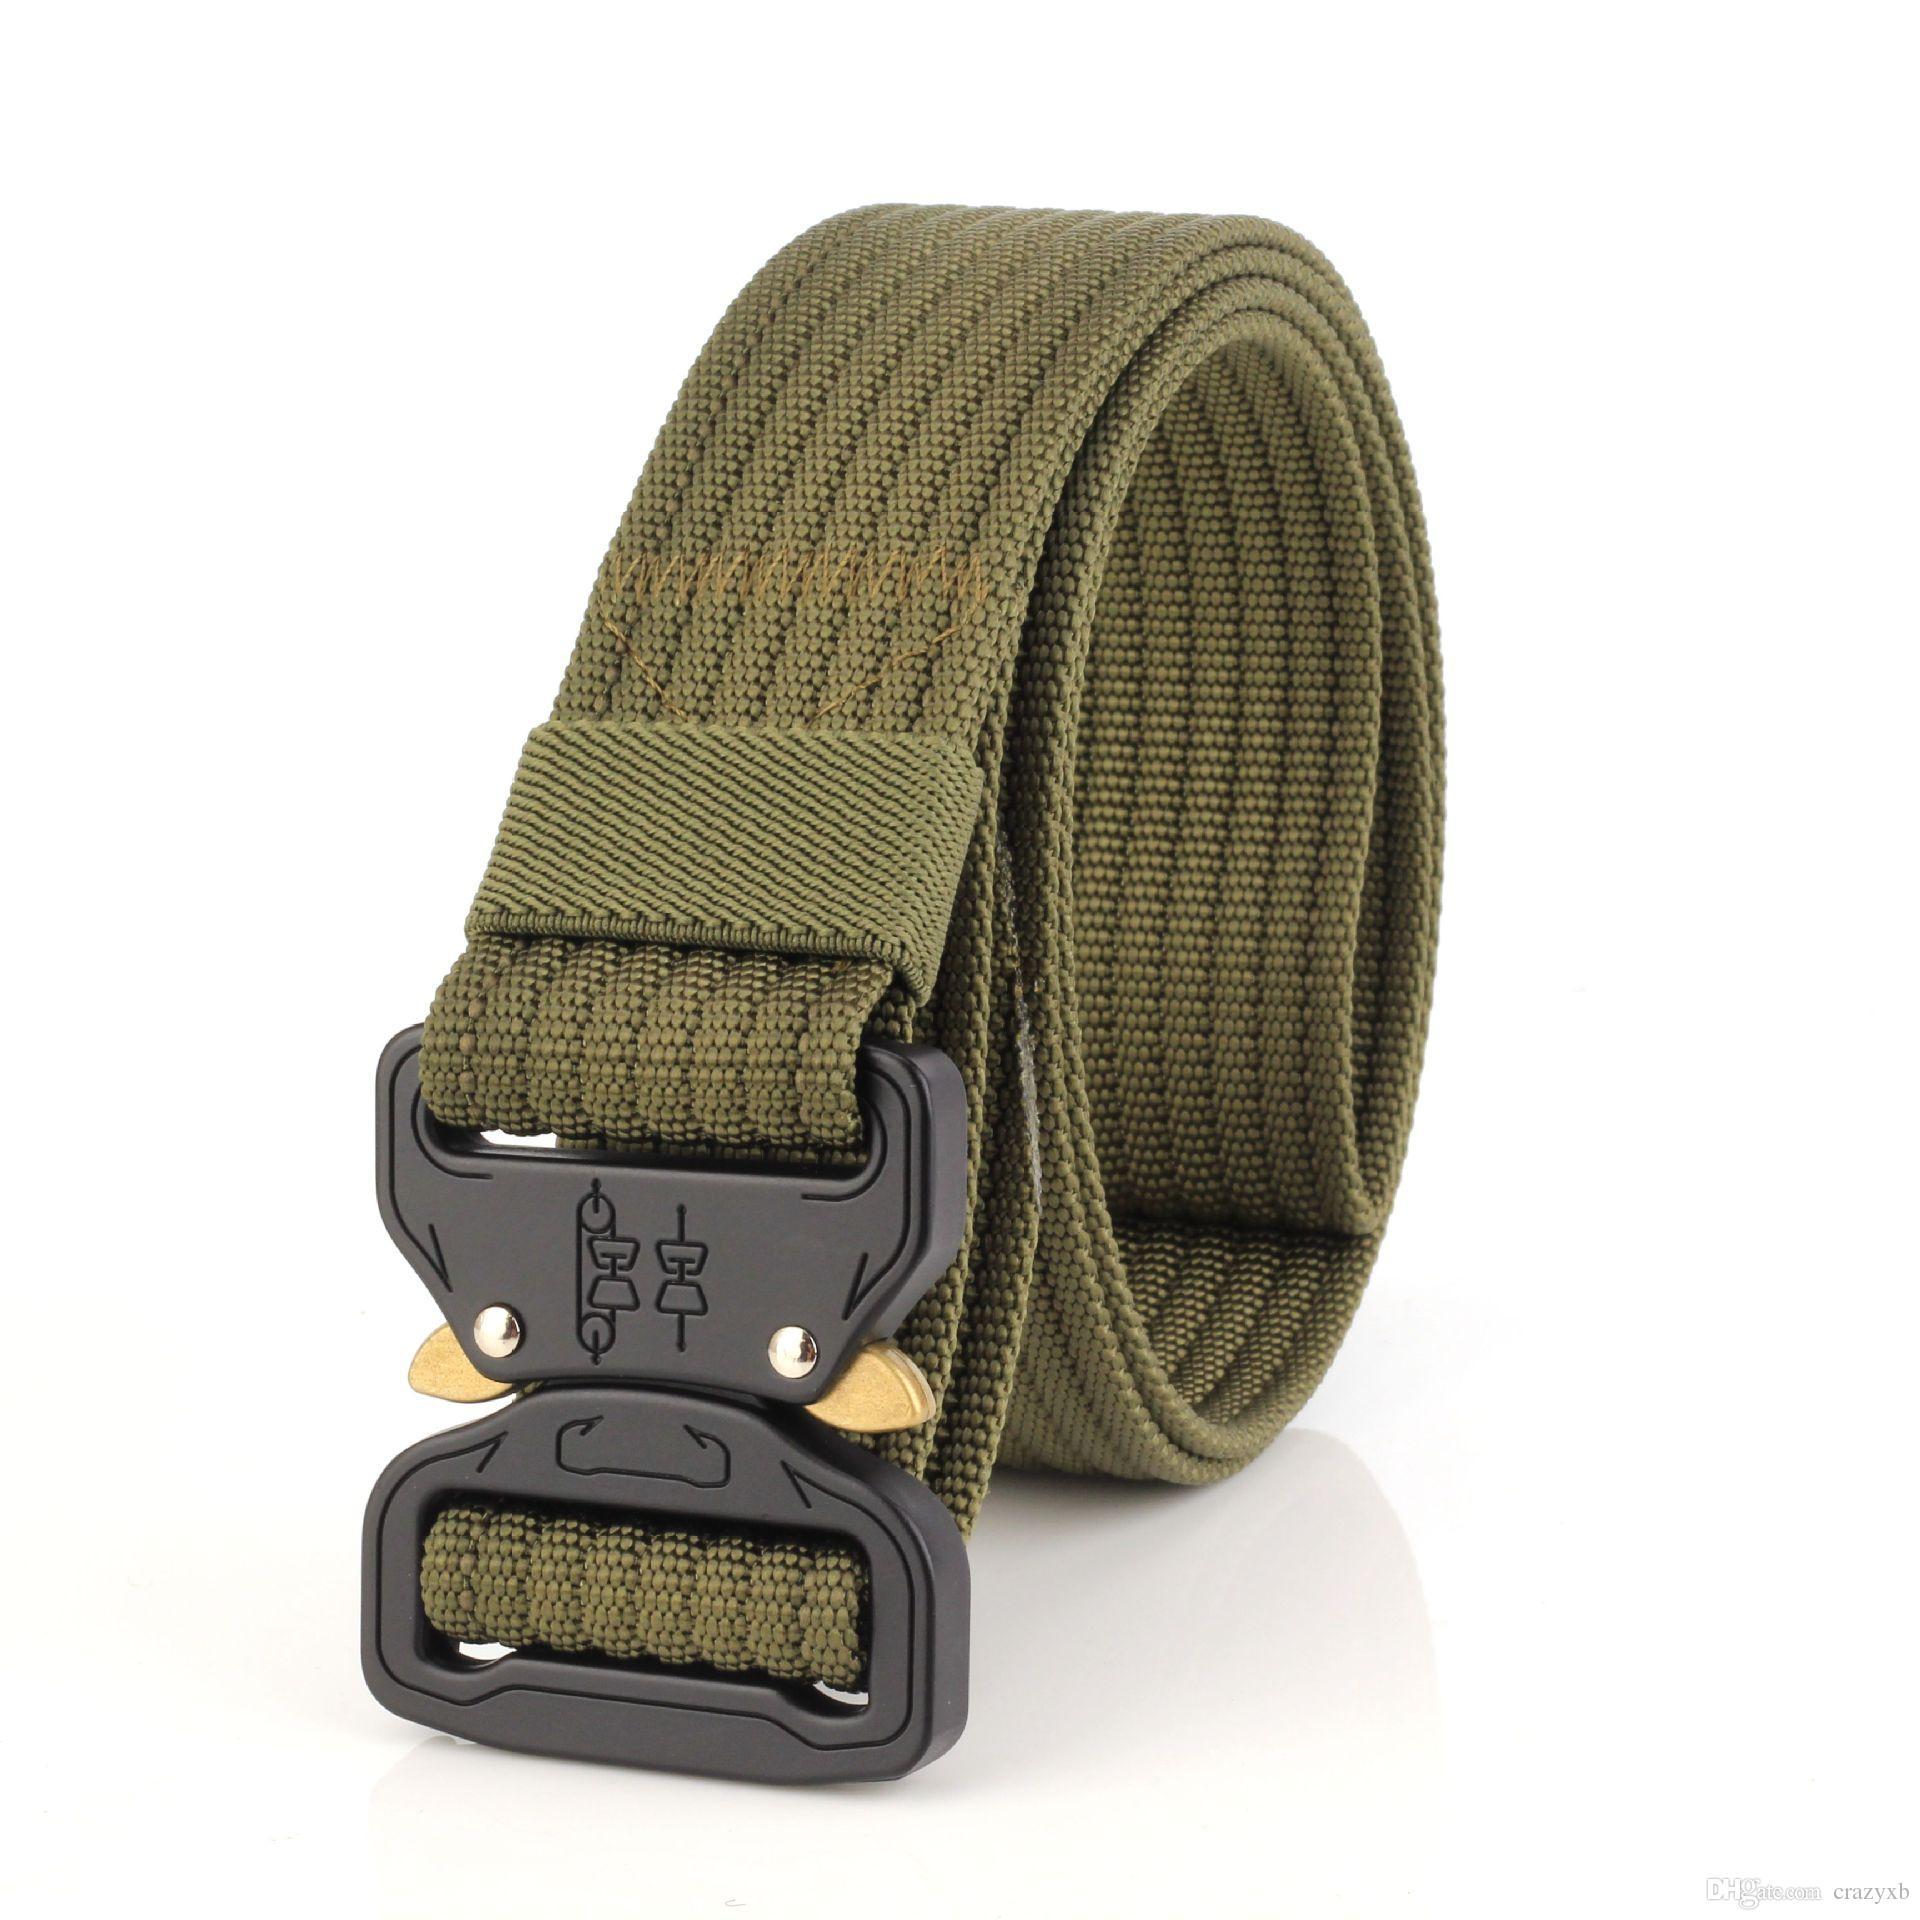 Hombres SWAT Equipo militar Paintball Army Belt Heavy Duty US Soldado Combat Tactical Belts Nylon Waistband